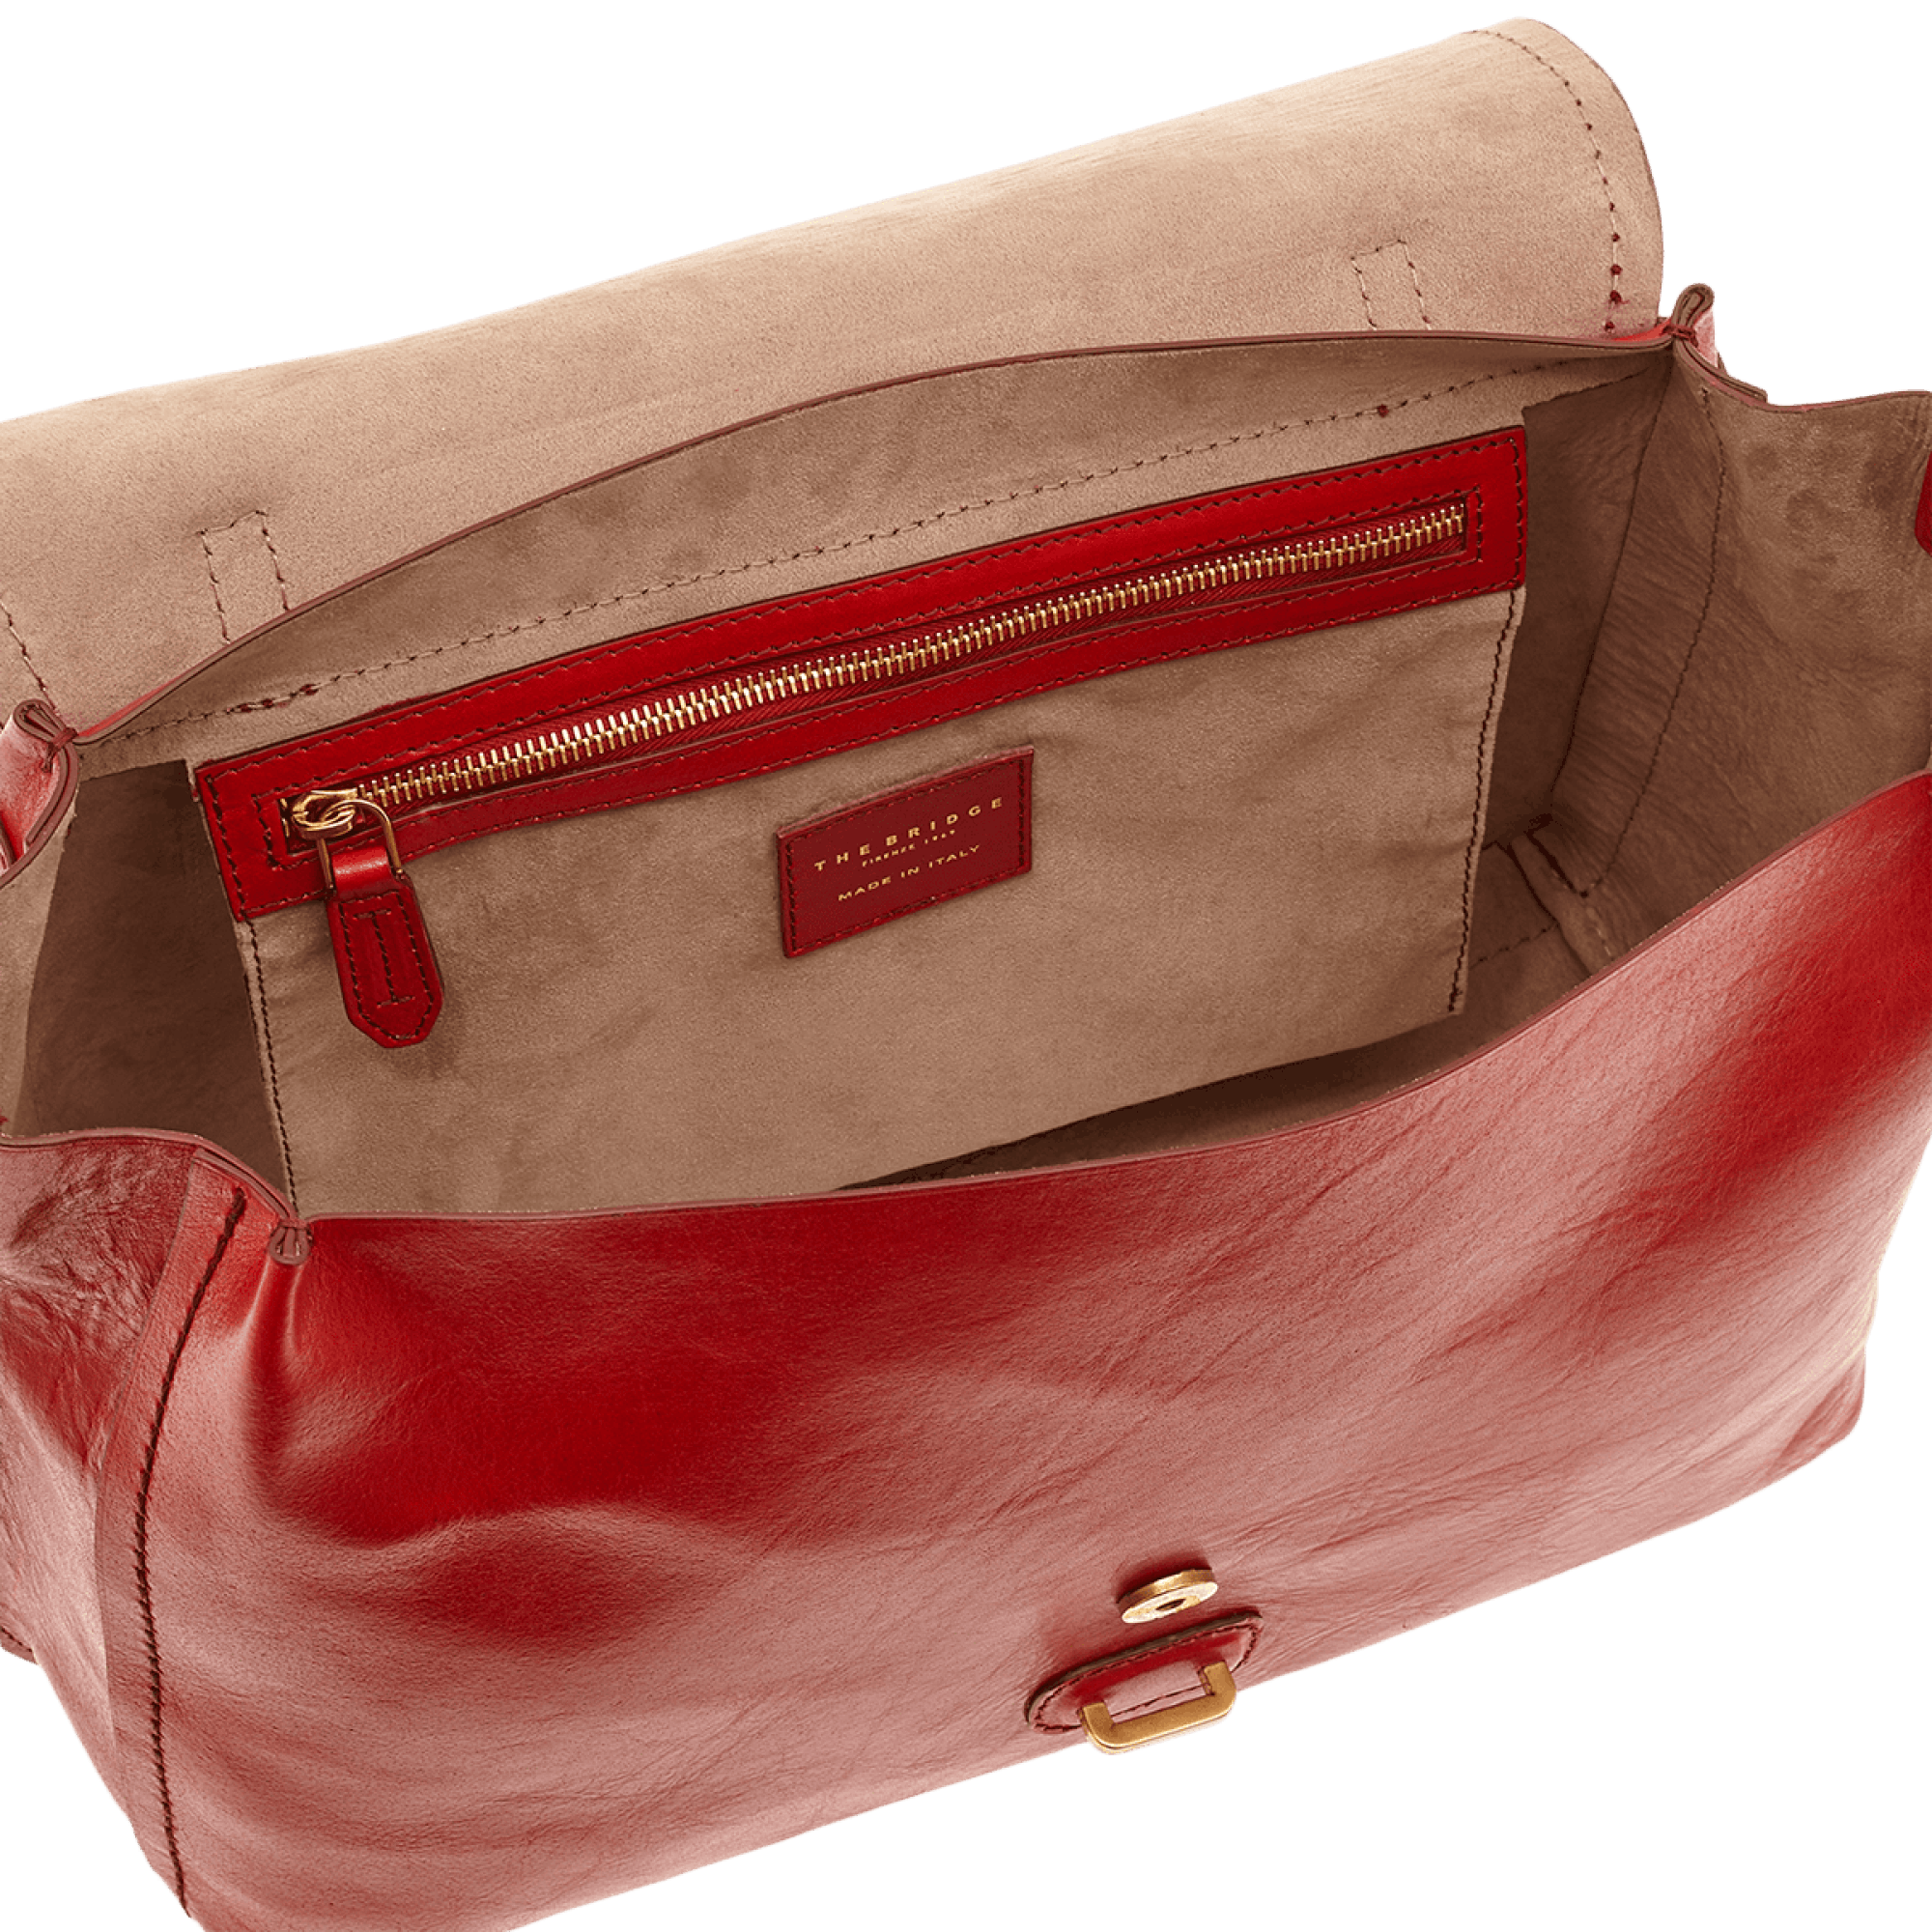 DUAL FUNCTION BAG